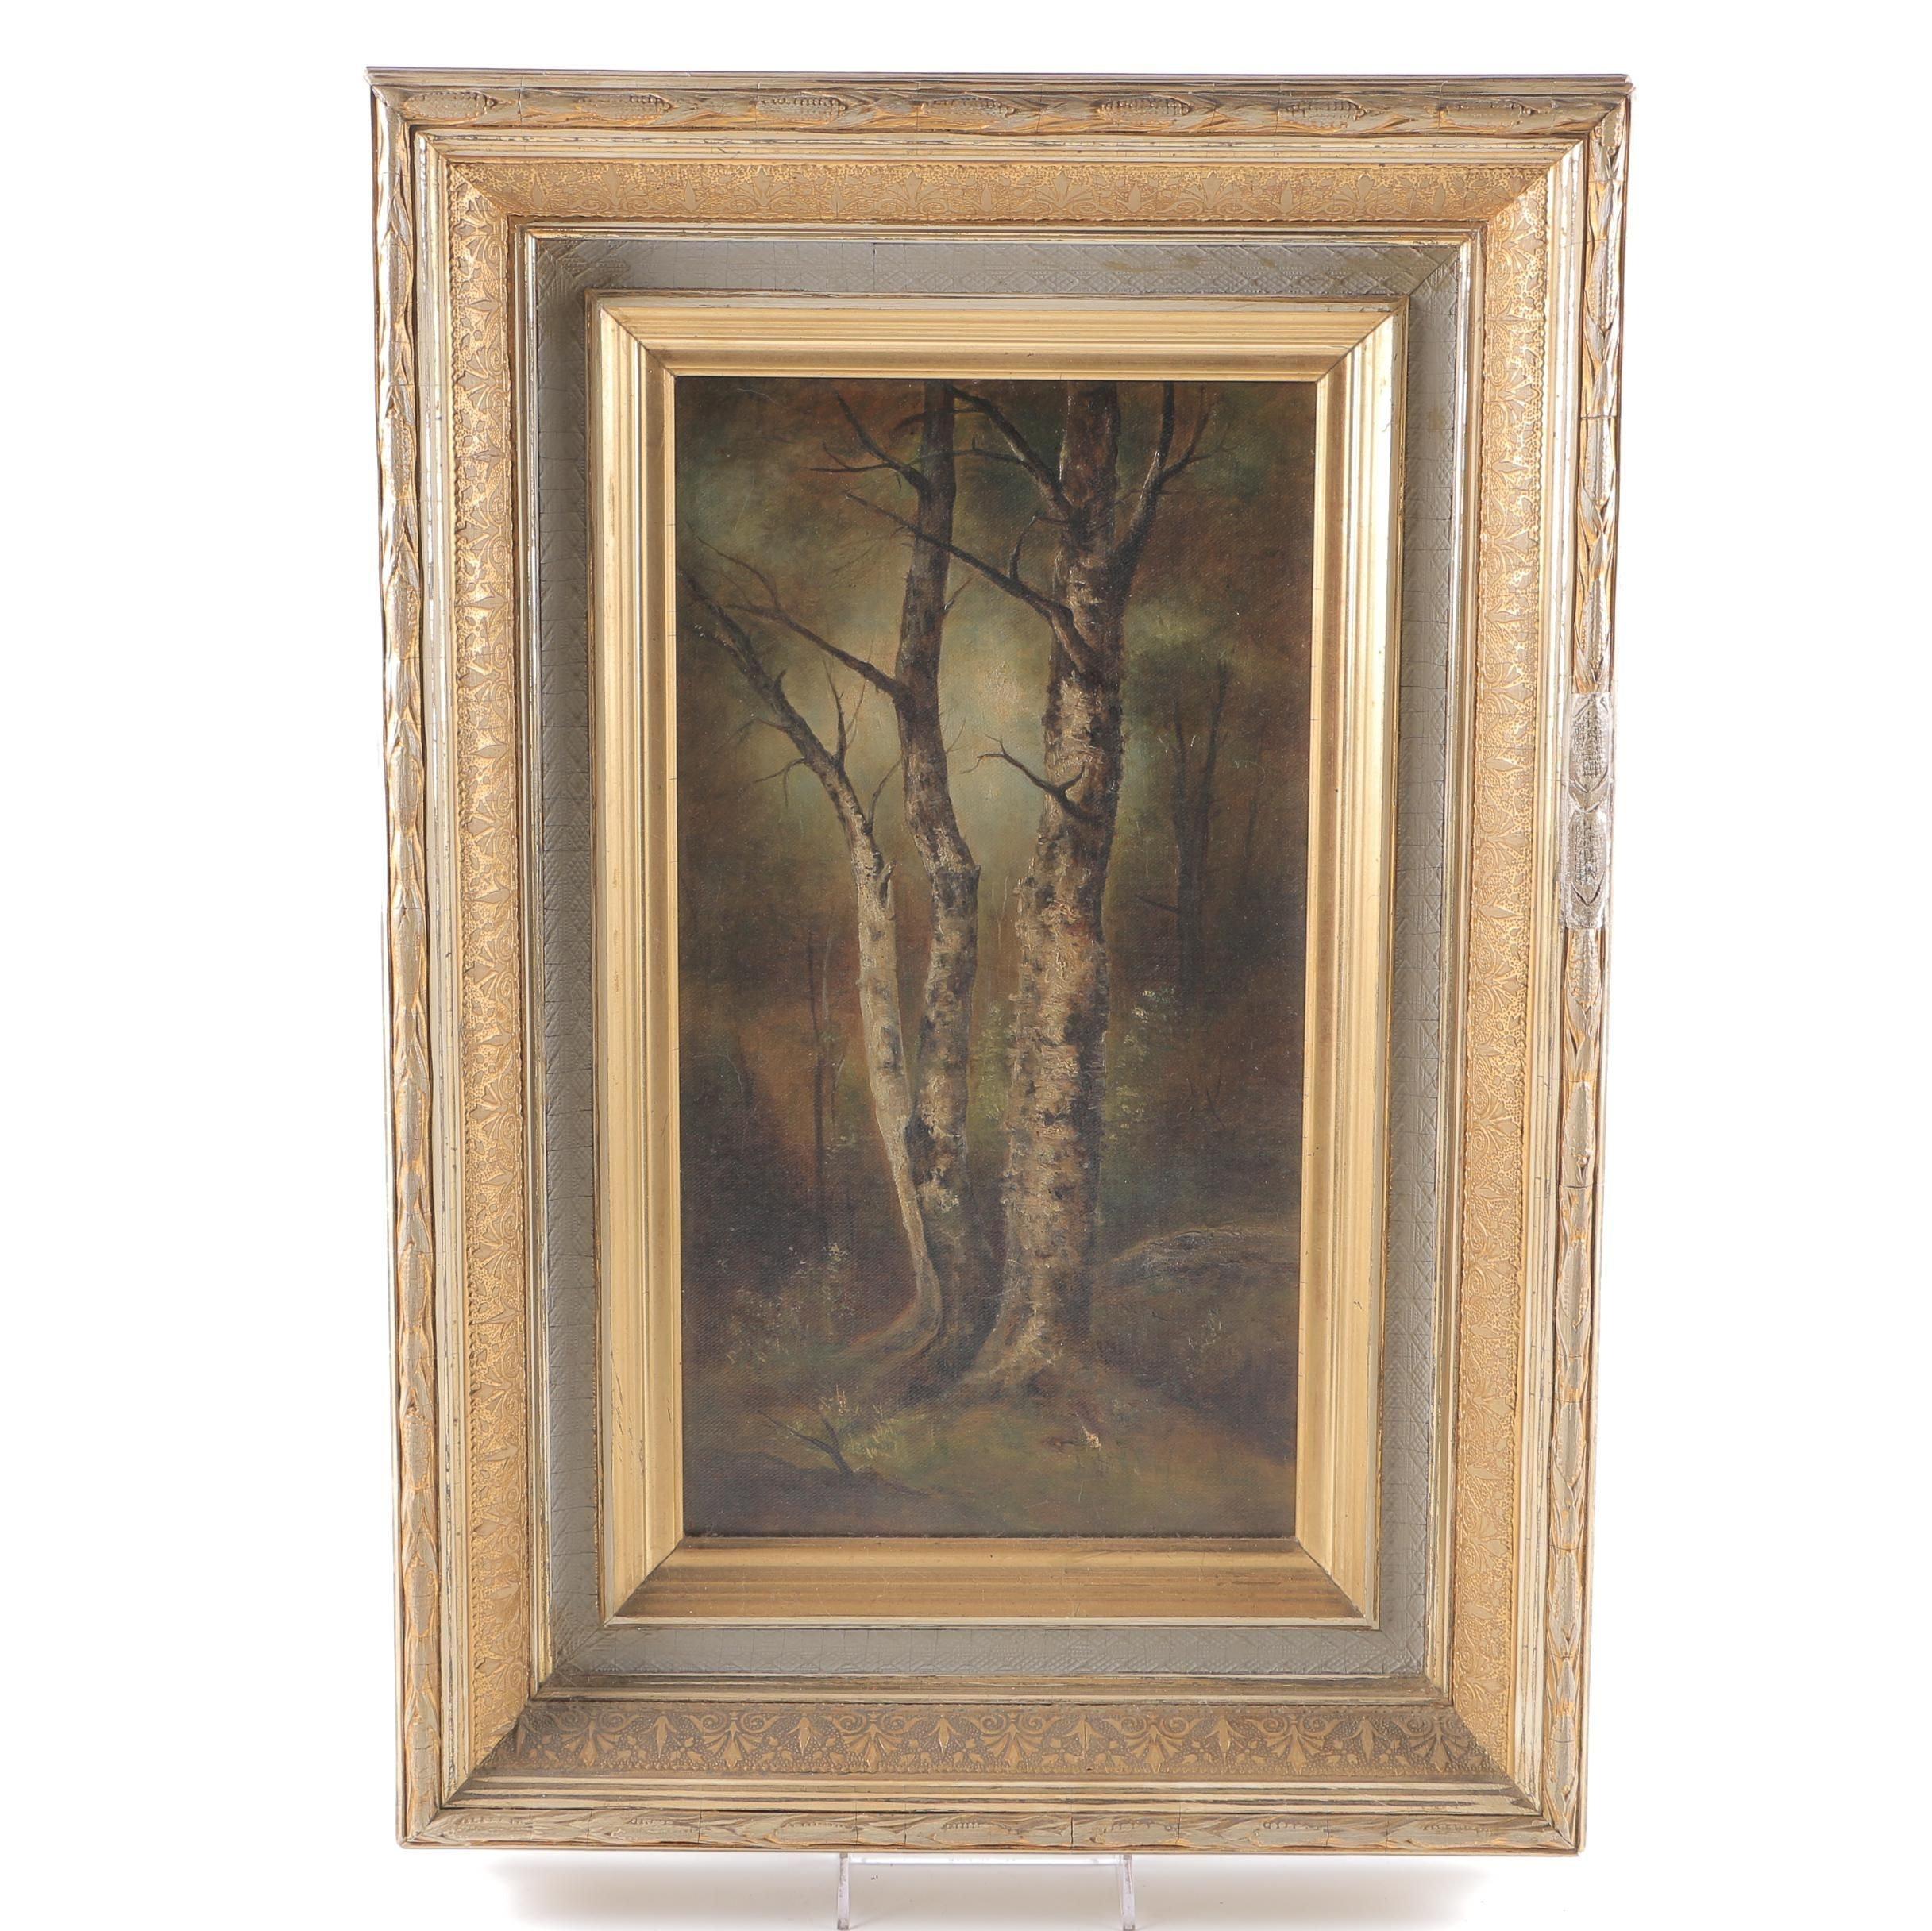 Original Oil on Canvas Painting of Woodland Scene